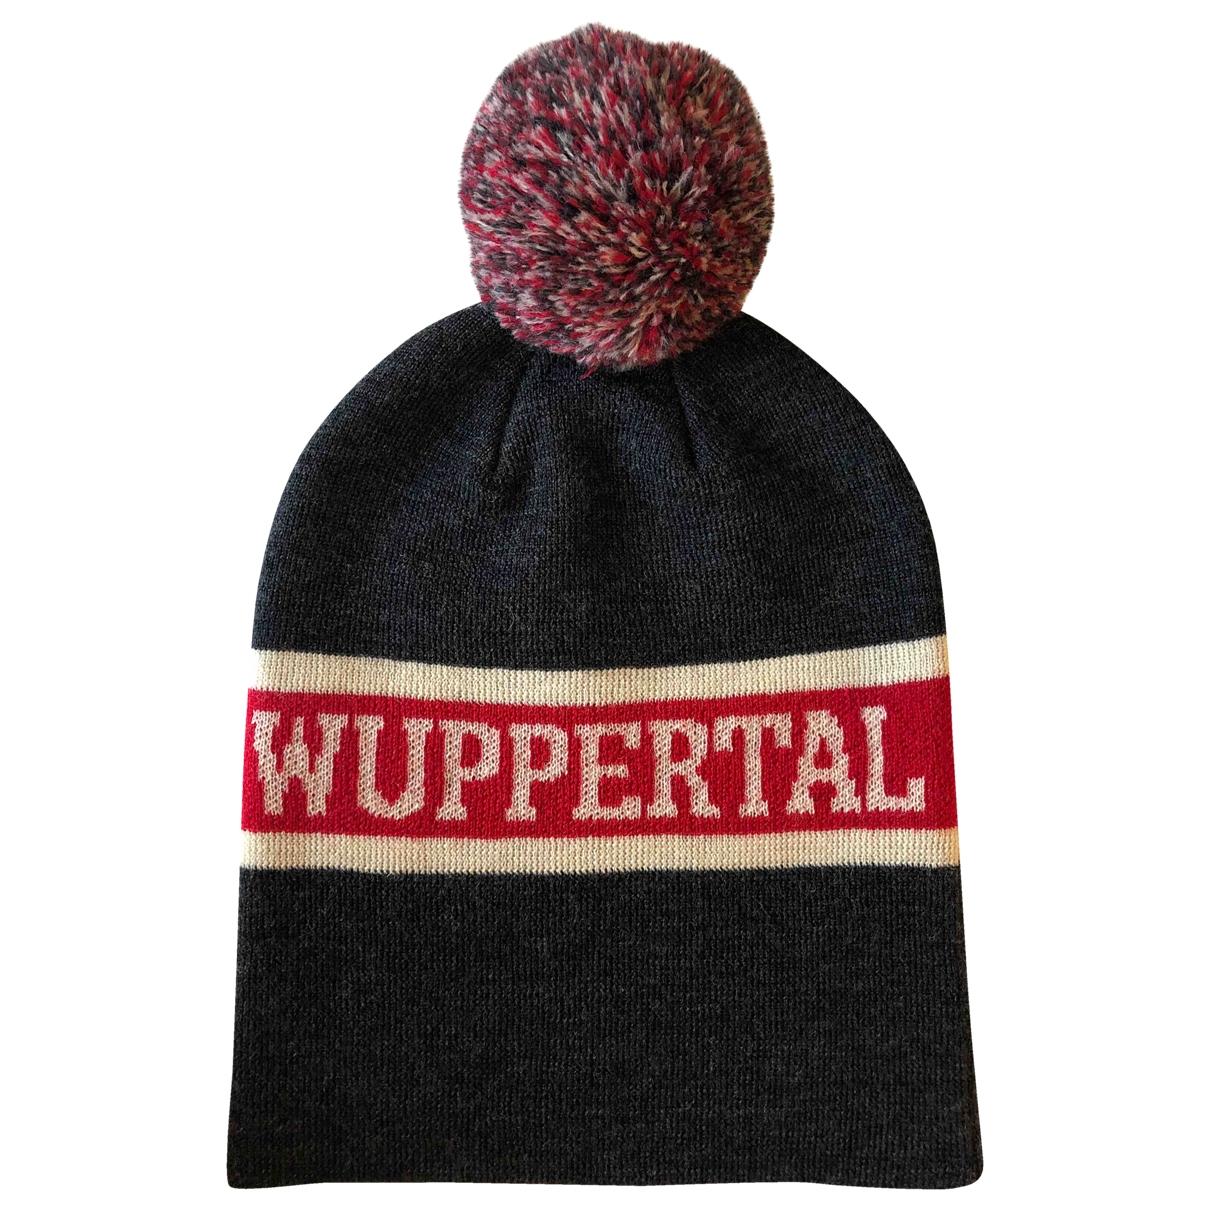 Isabel Marant Etoile \N Anthracite Wool hat for Women M International